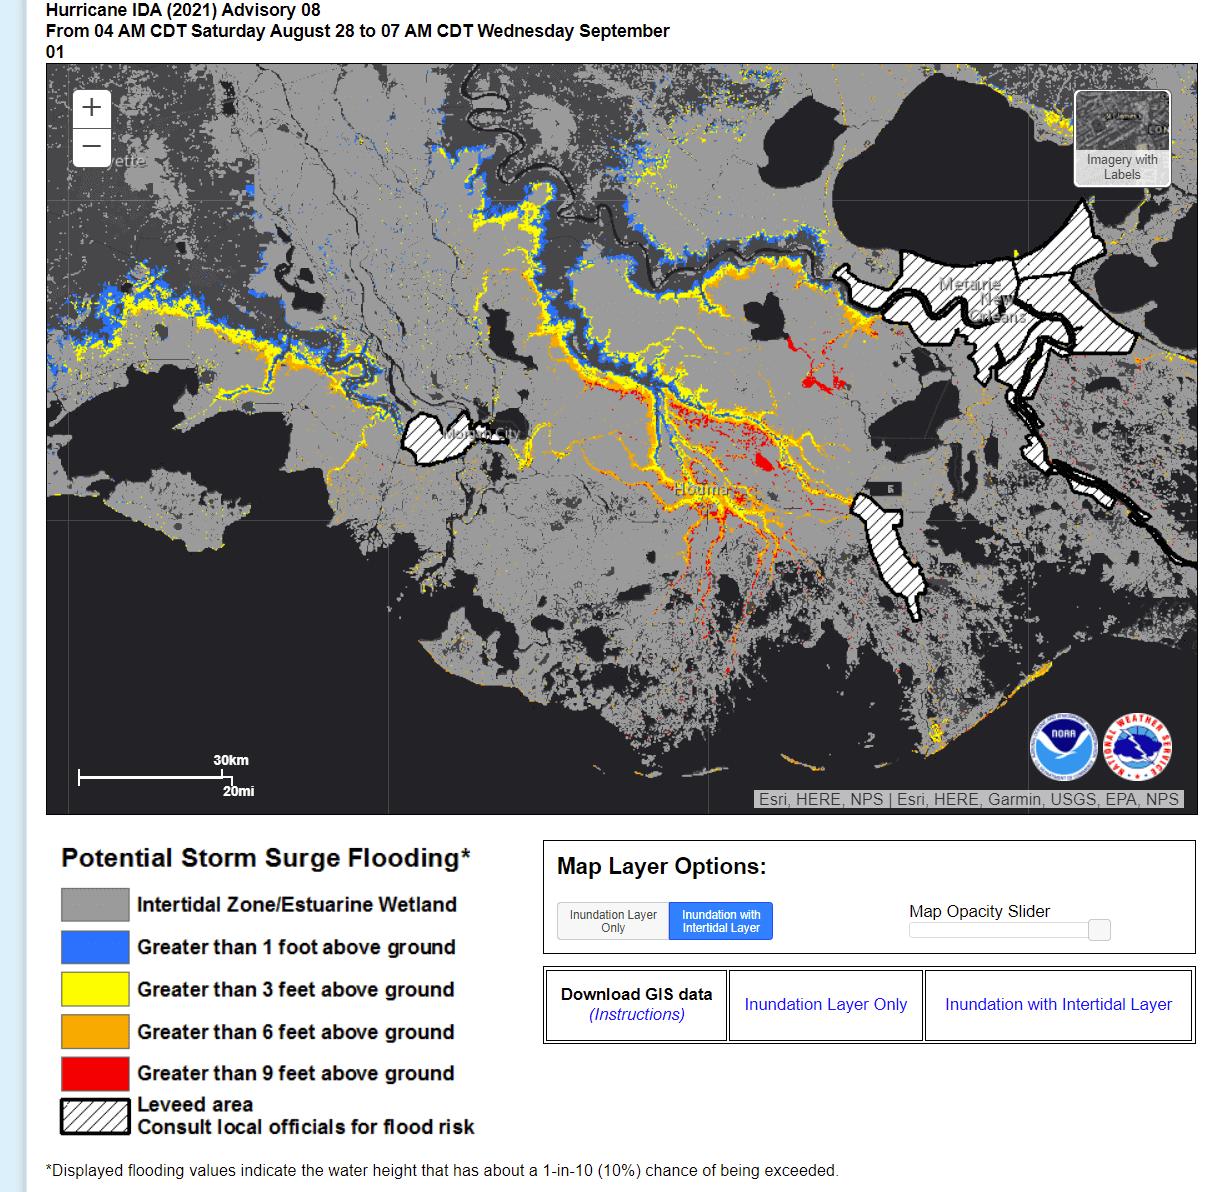 atlantic-hurricane-season-2021-ida-louisiana-storm-surge-inundation